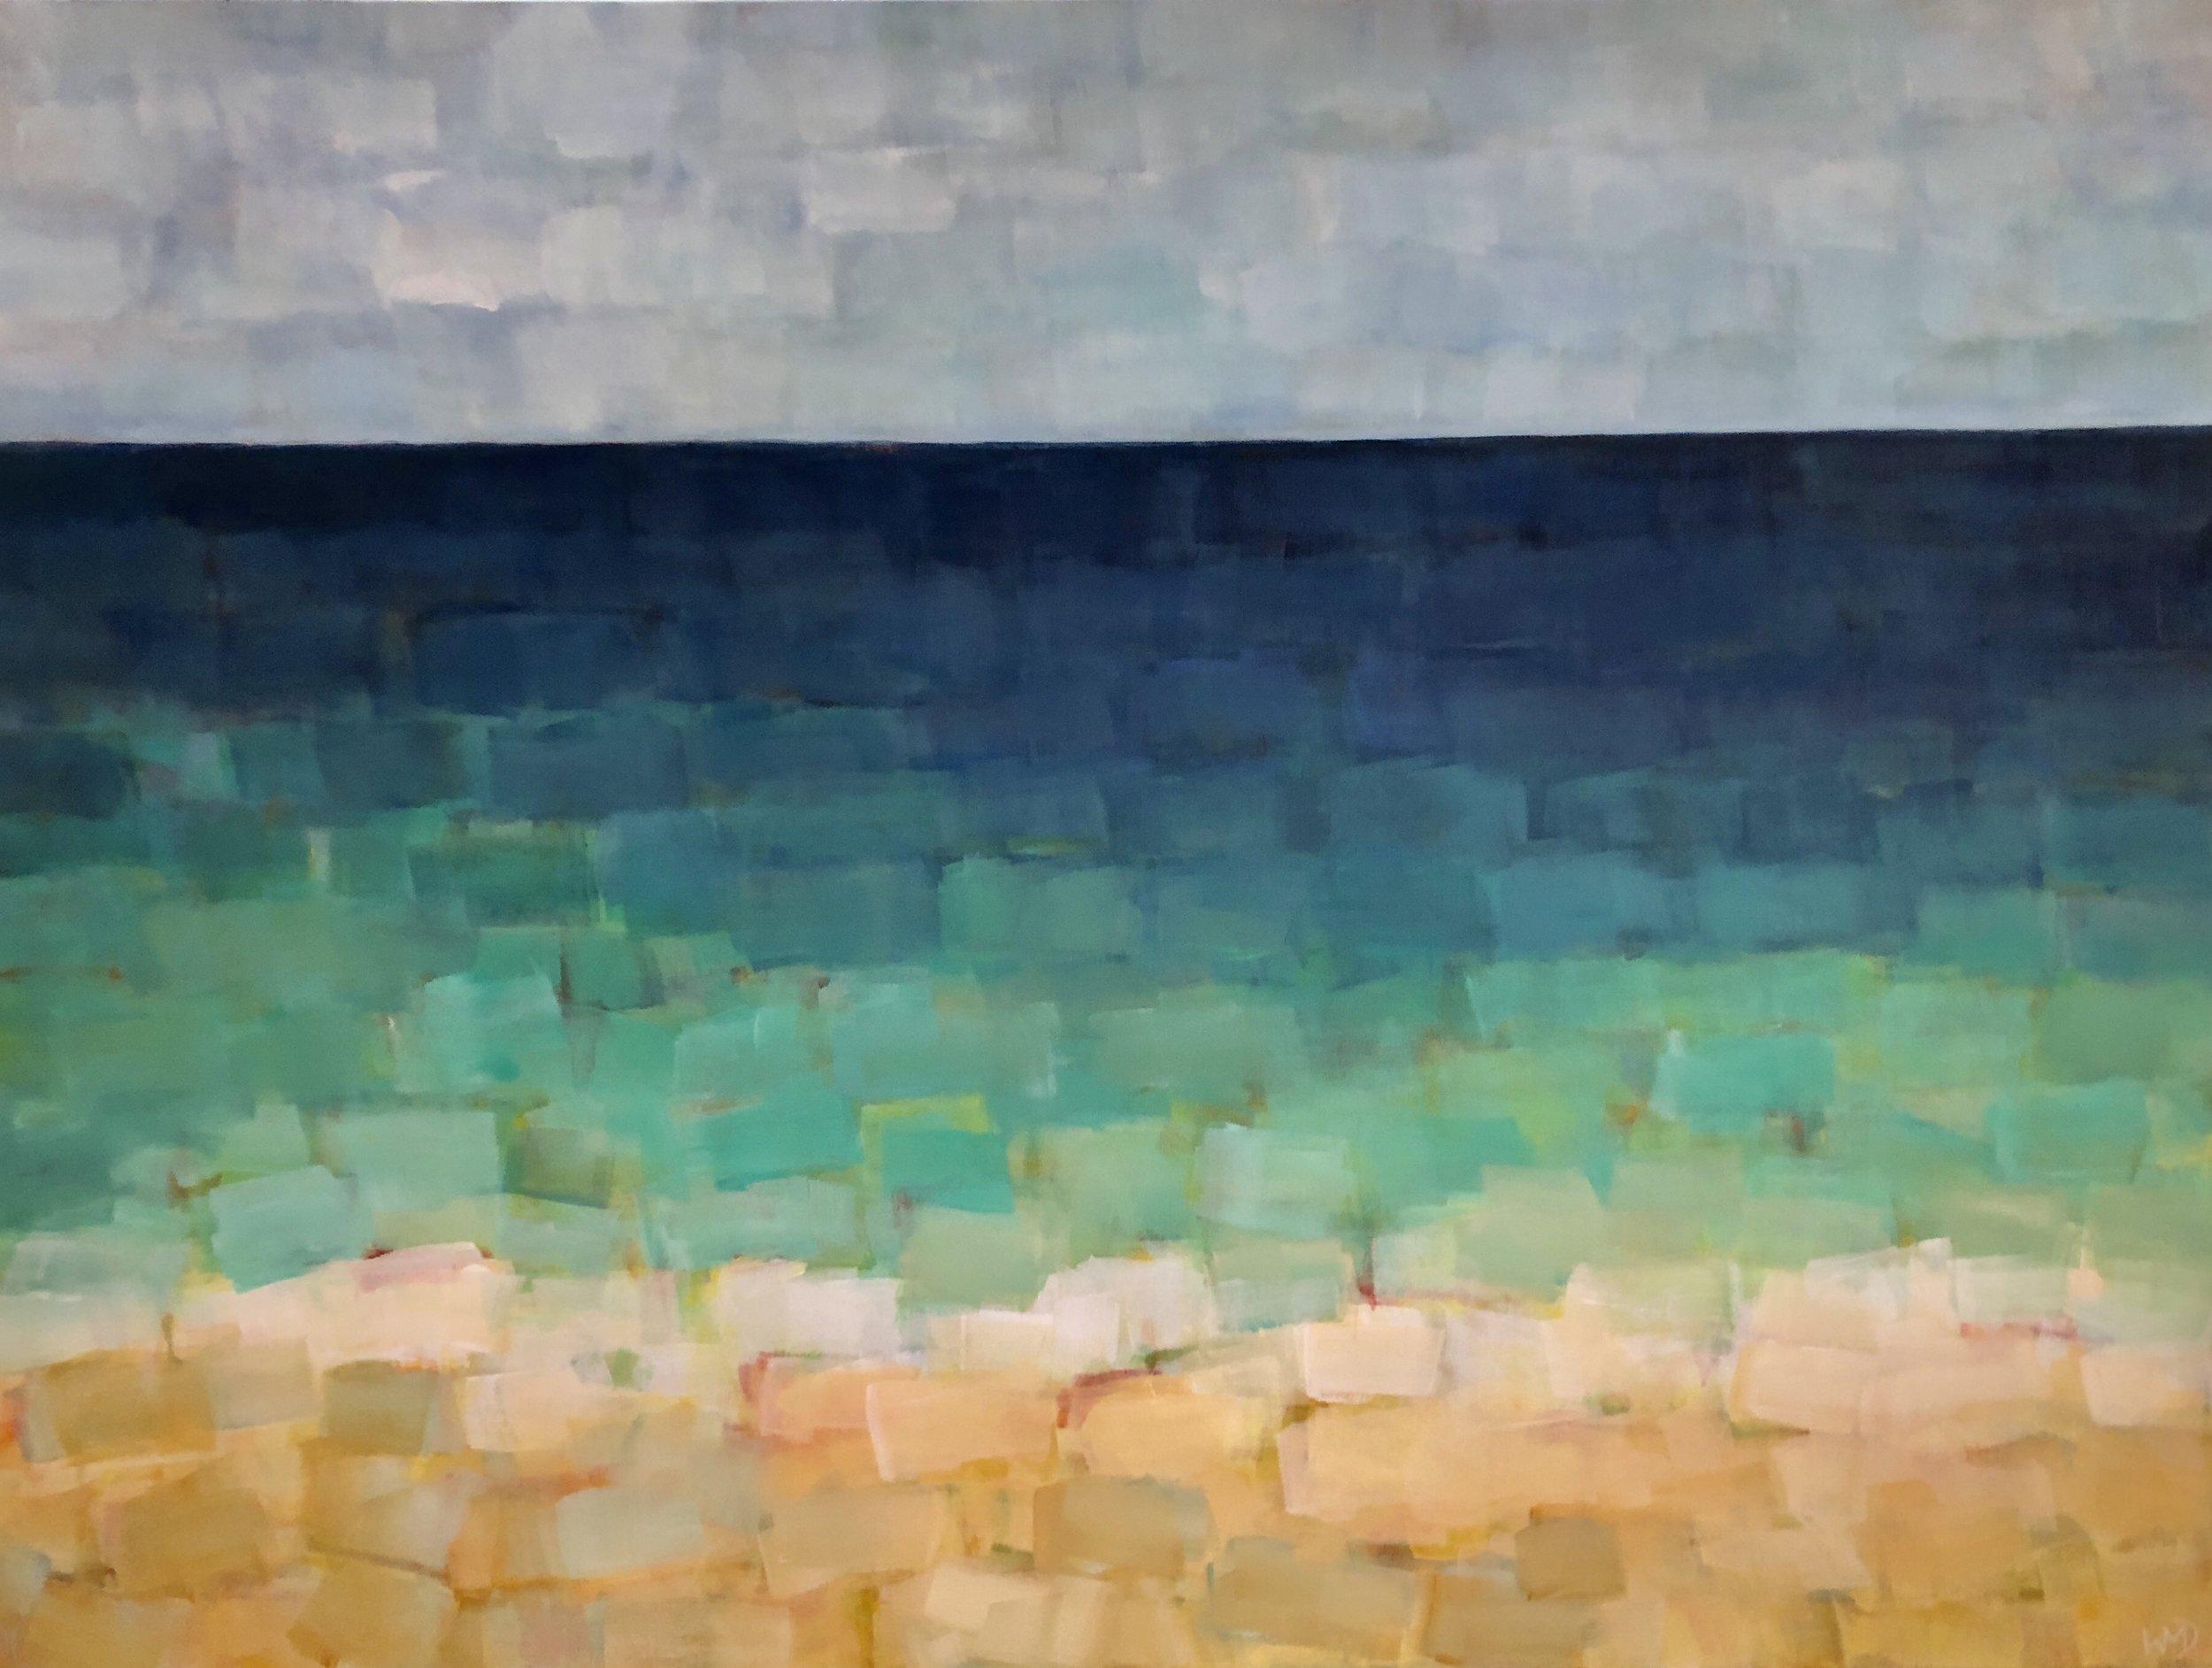 Ocean commission - 2018